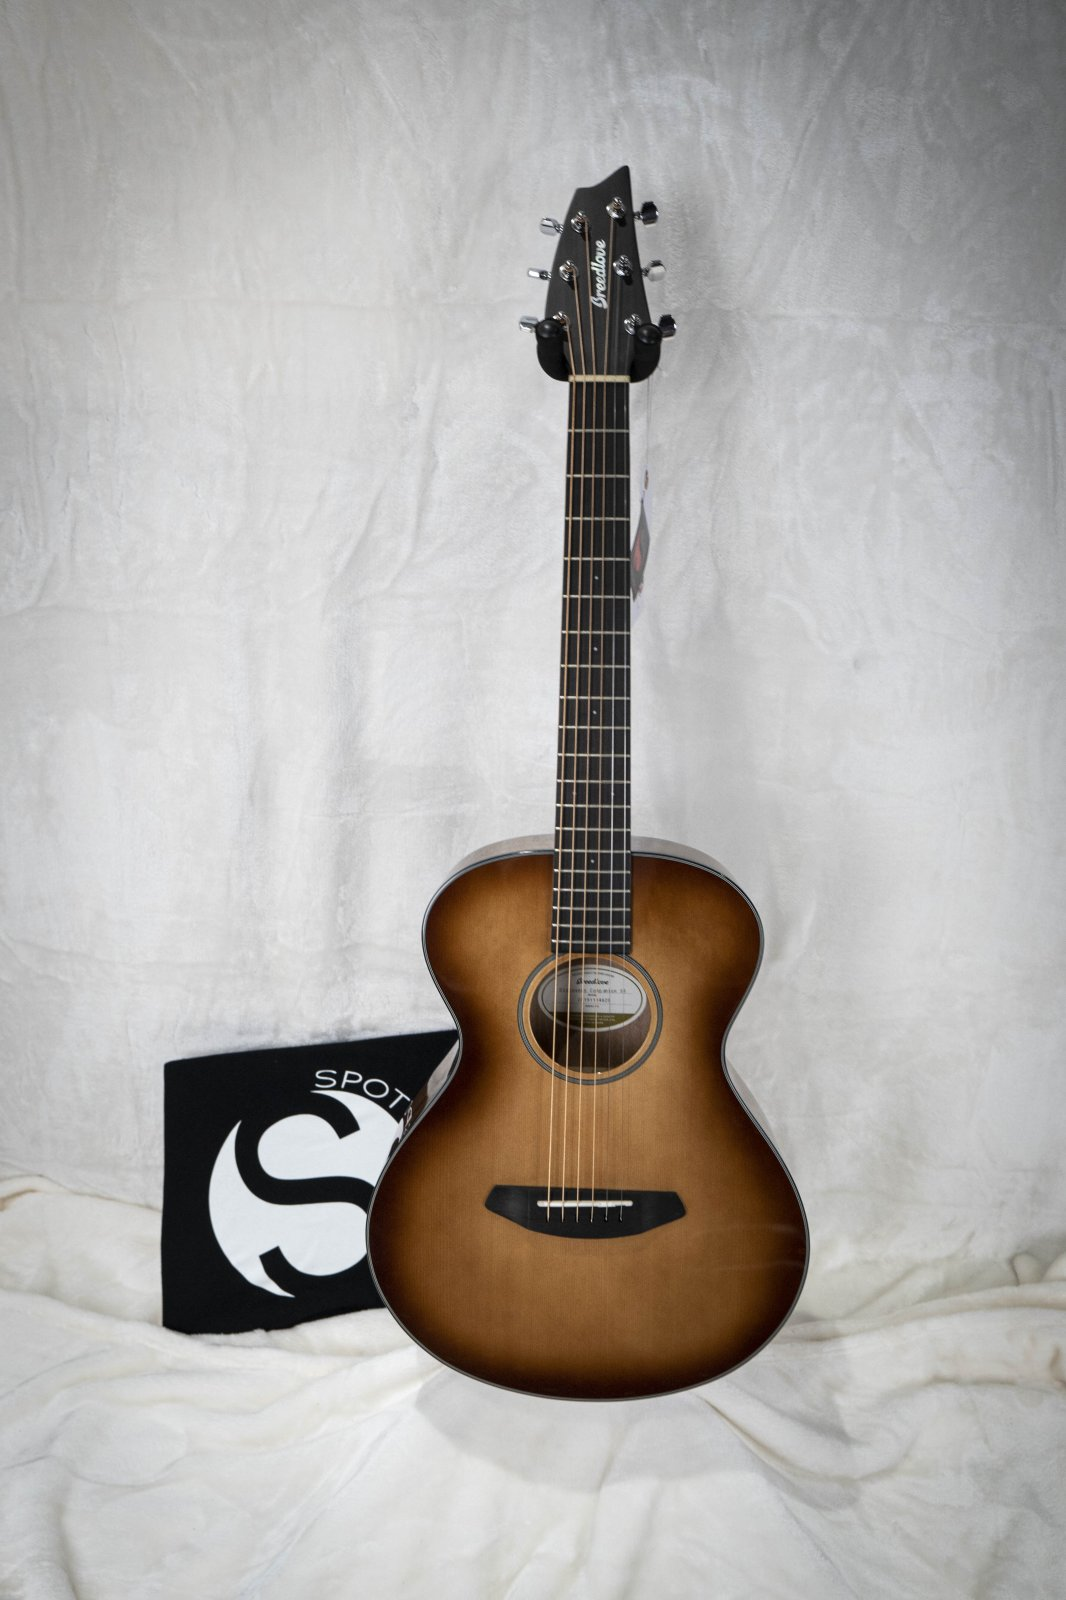 Breedlove Discovery Companion Sunburst Acoustic Guitar